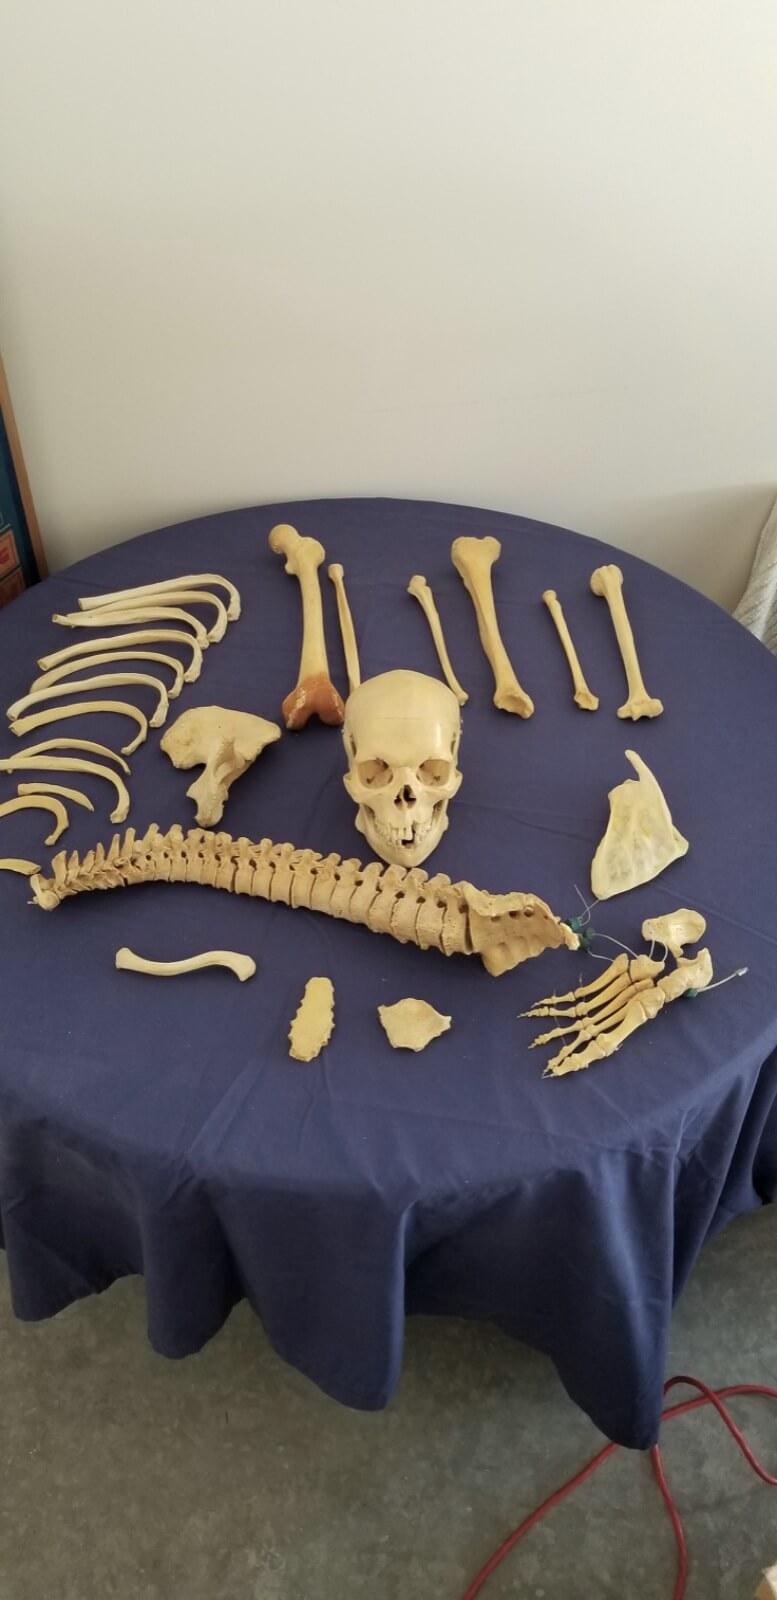 Human Bones for study